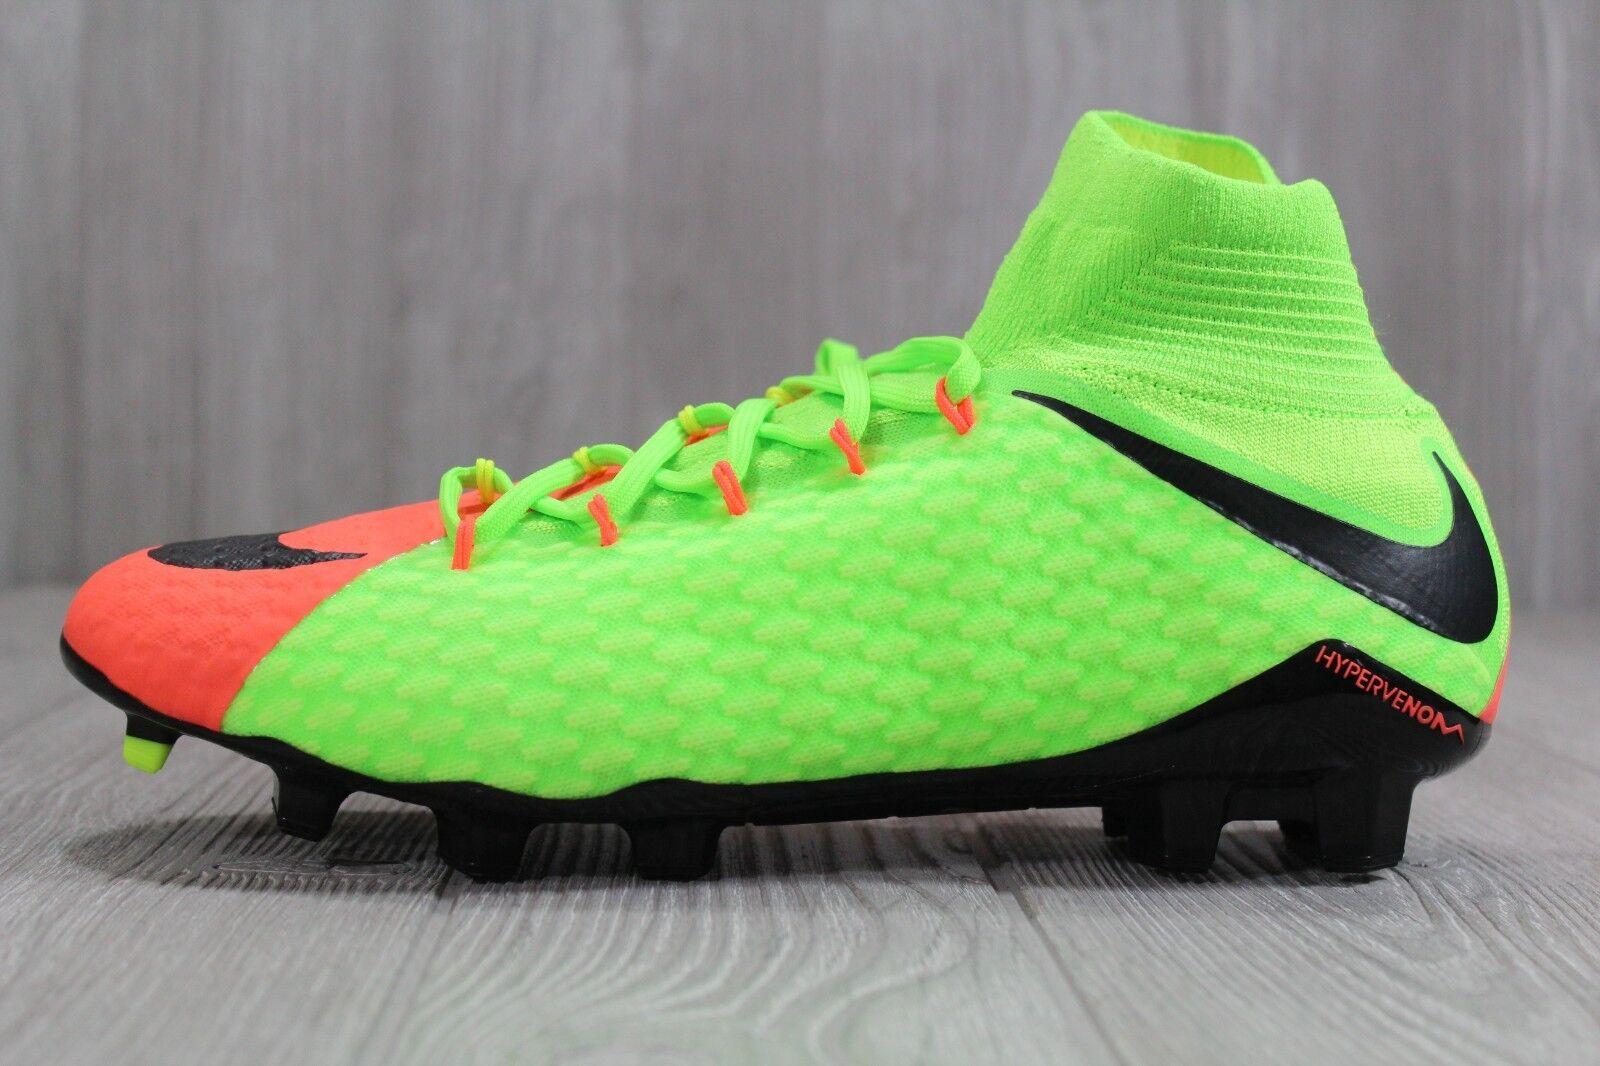 37 Mens Nike Hypervenom Phatal III DF FG Soccer Cleats Green Size 10 852554 308